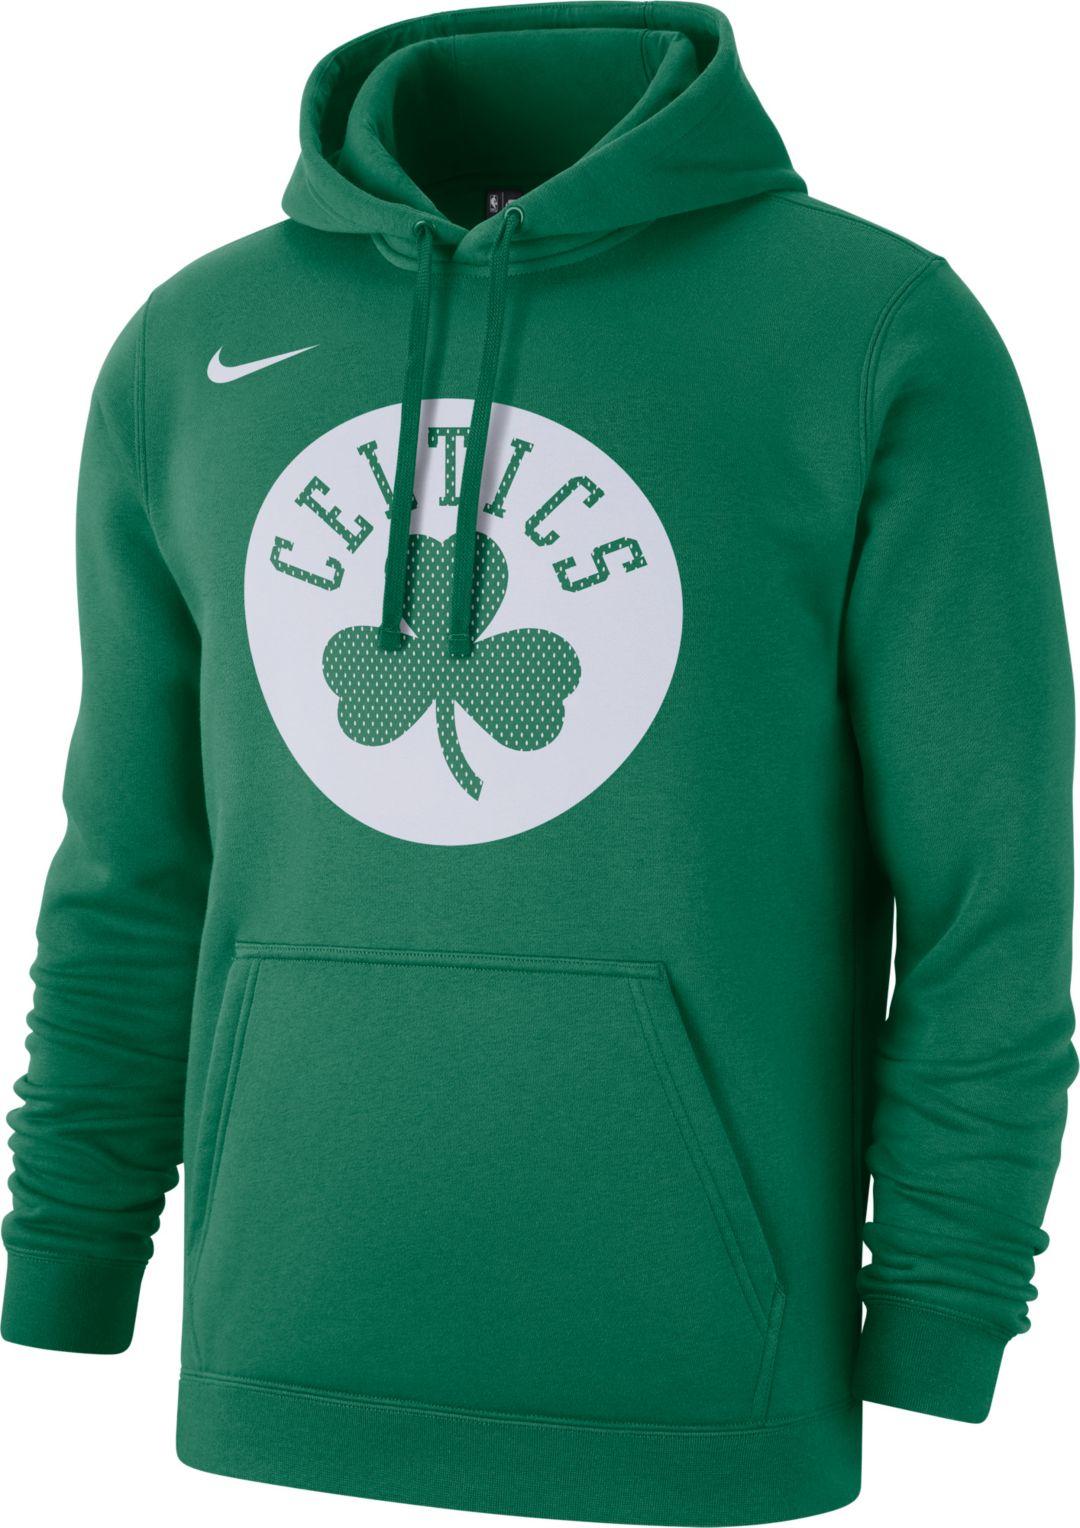 promo code 18306 6486a Nike Men's Boston Celtics Pullover Hoodie